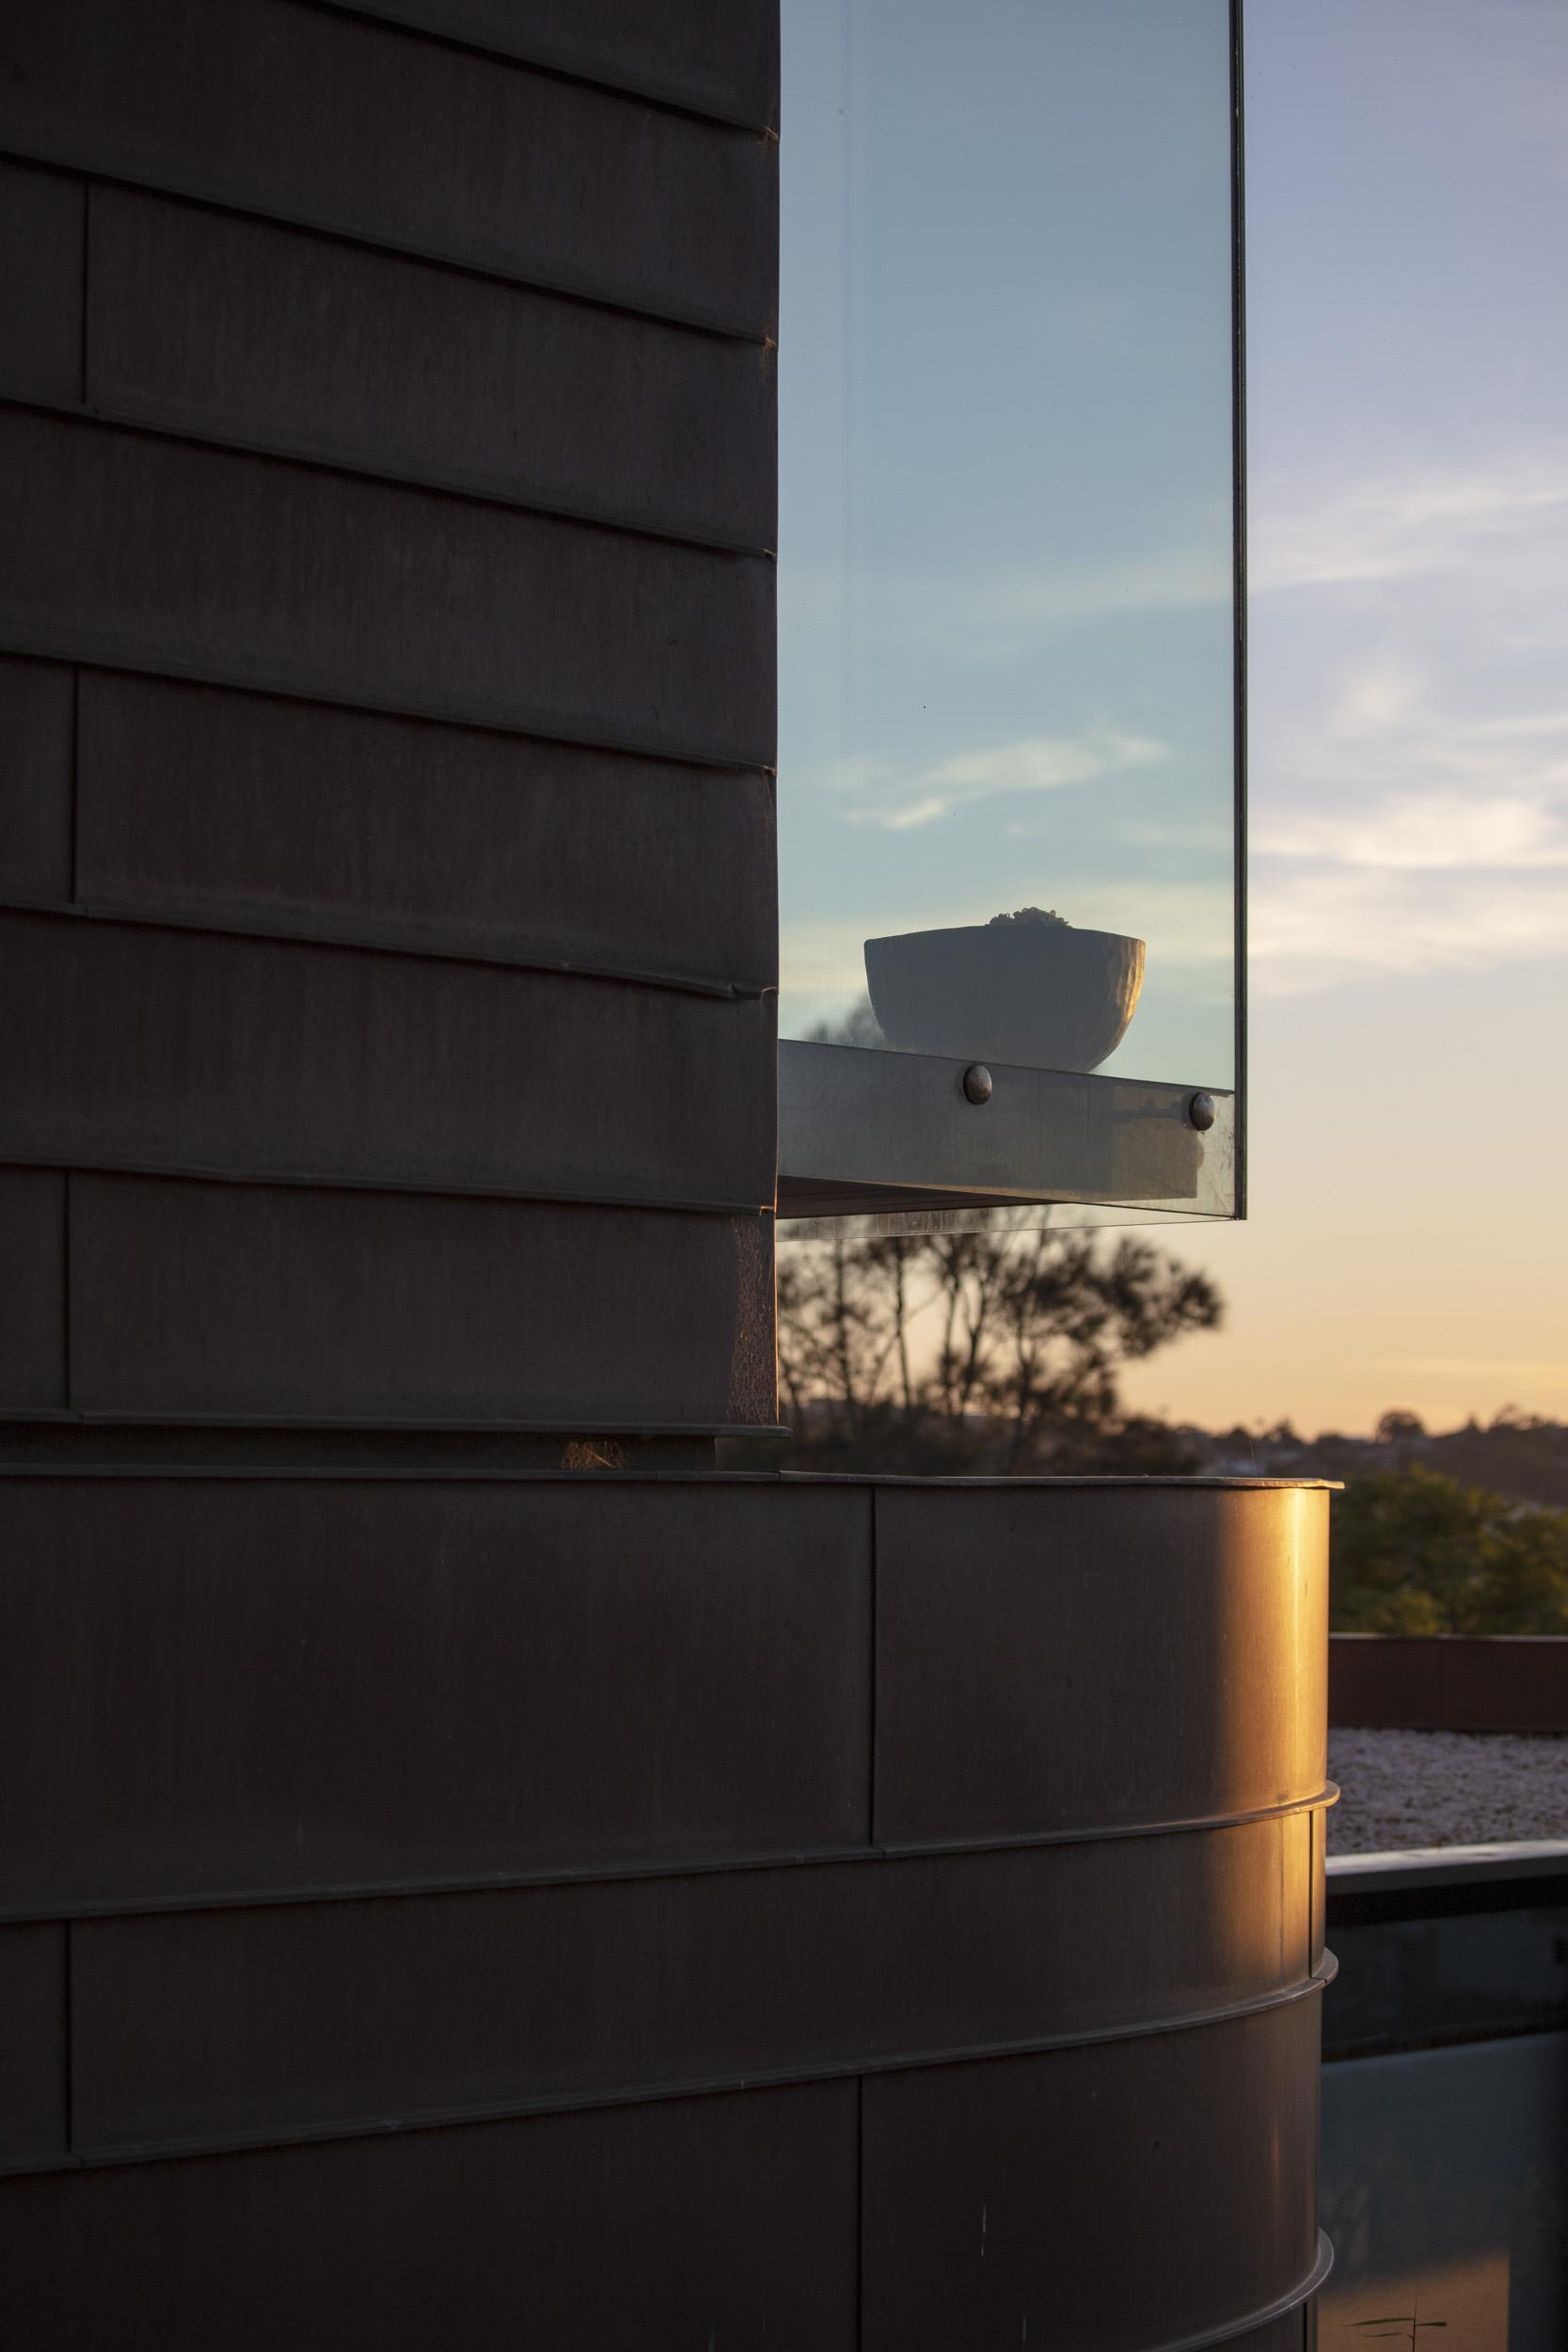 residential_architect_photographer_sydney_03.jpg